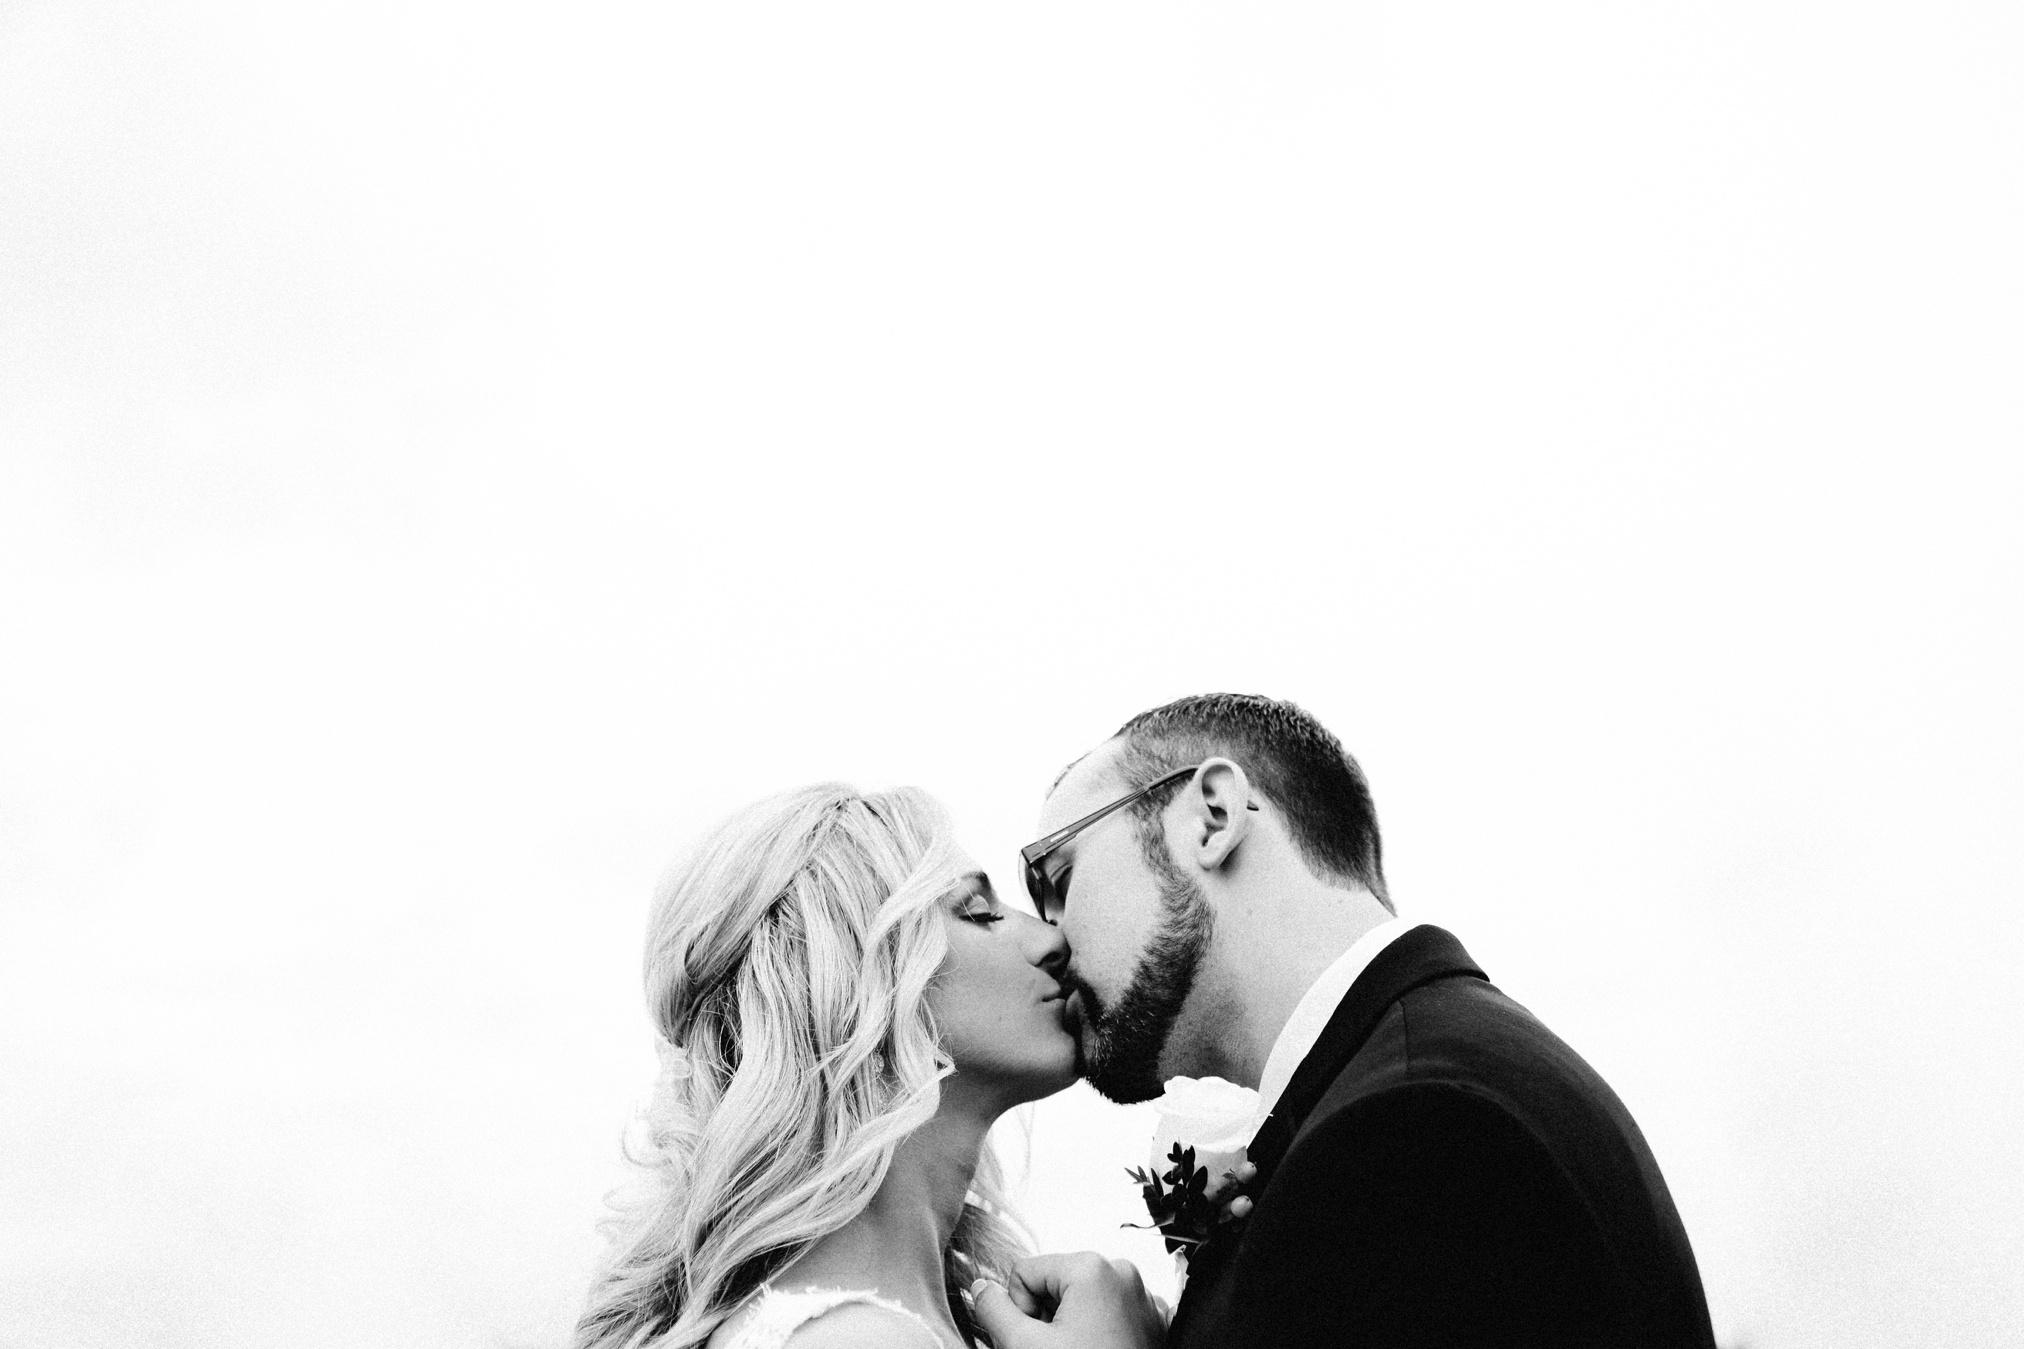 schmid_wedding-641.jpg